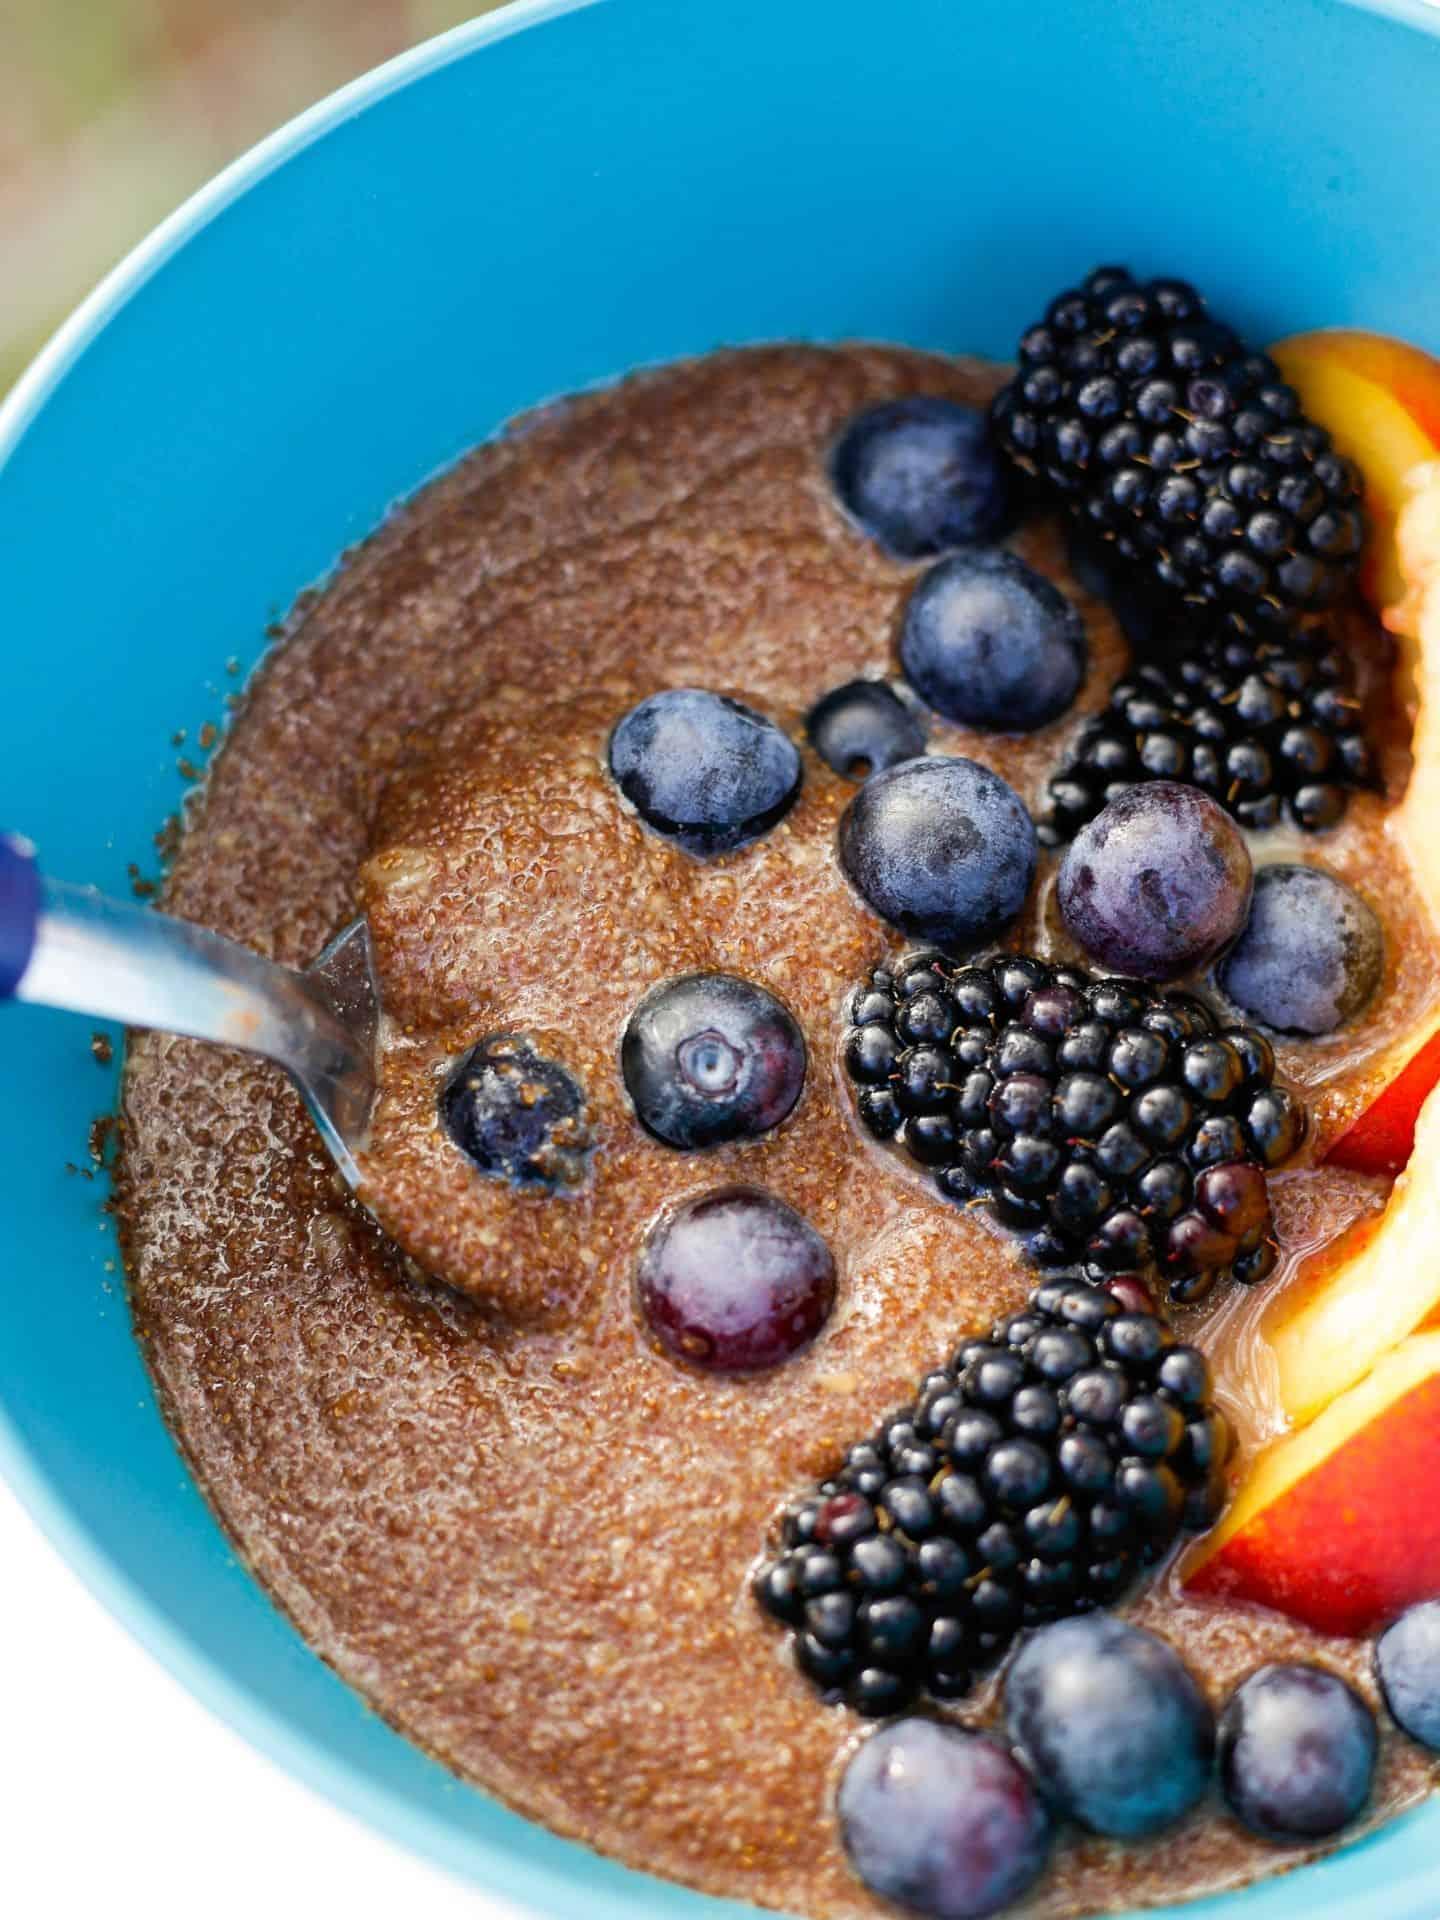 Teff Porridge Nahaufnahme